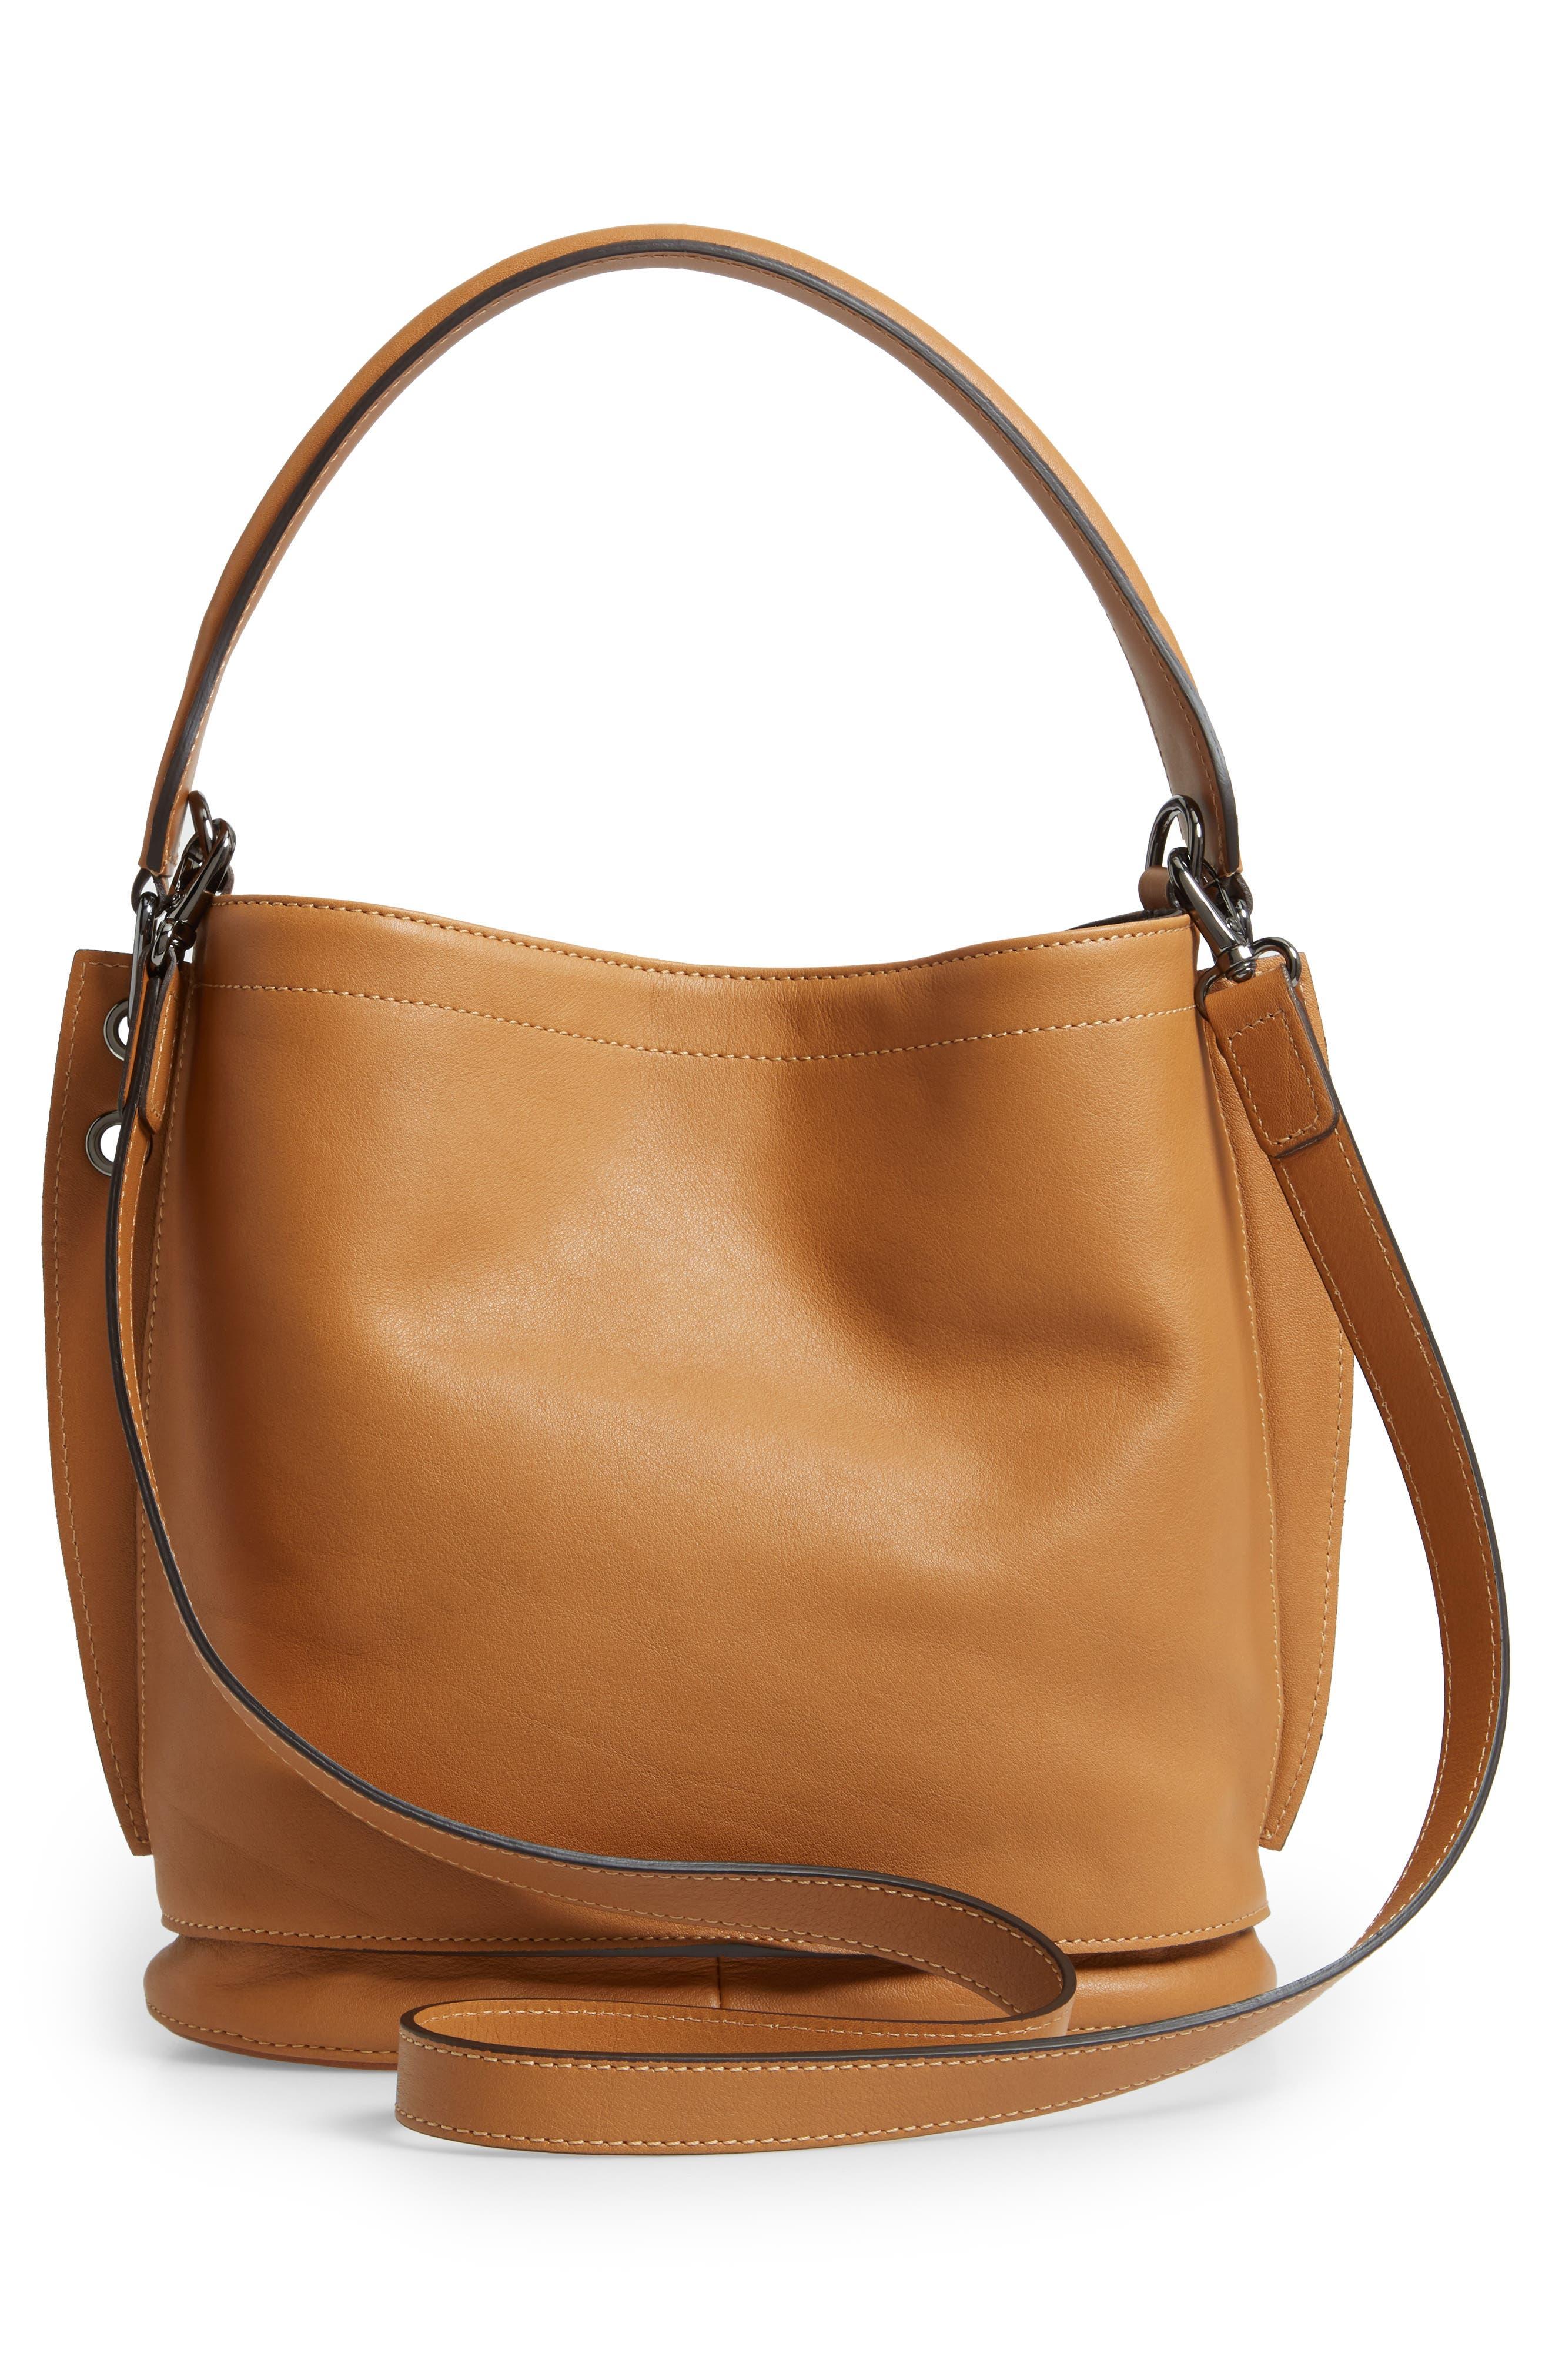 3D Leather Bucket Bag,                             Alternate thumbnail 3, color,                             NATURAL